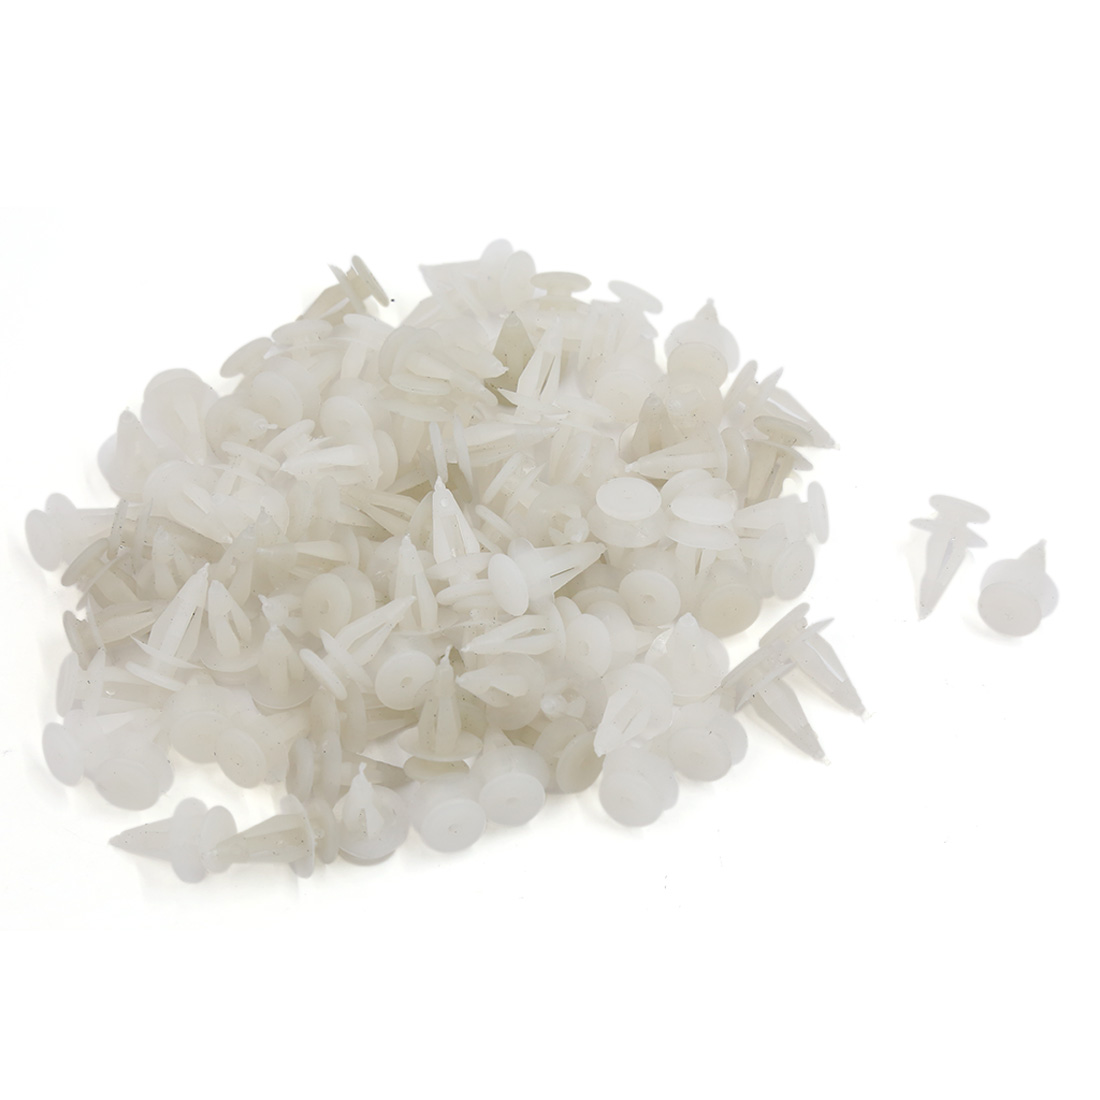 100 Pcs 7mm Sealing Nails White Plastic Rivet Buckle Clips